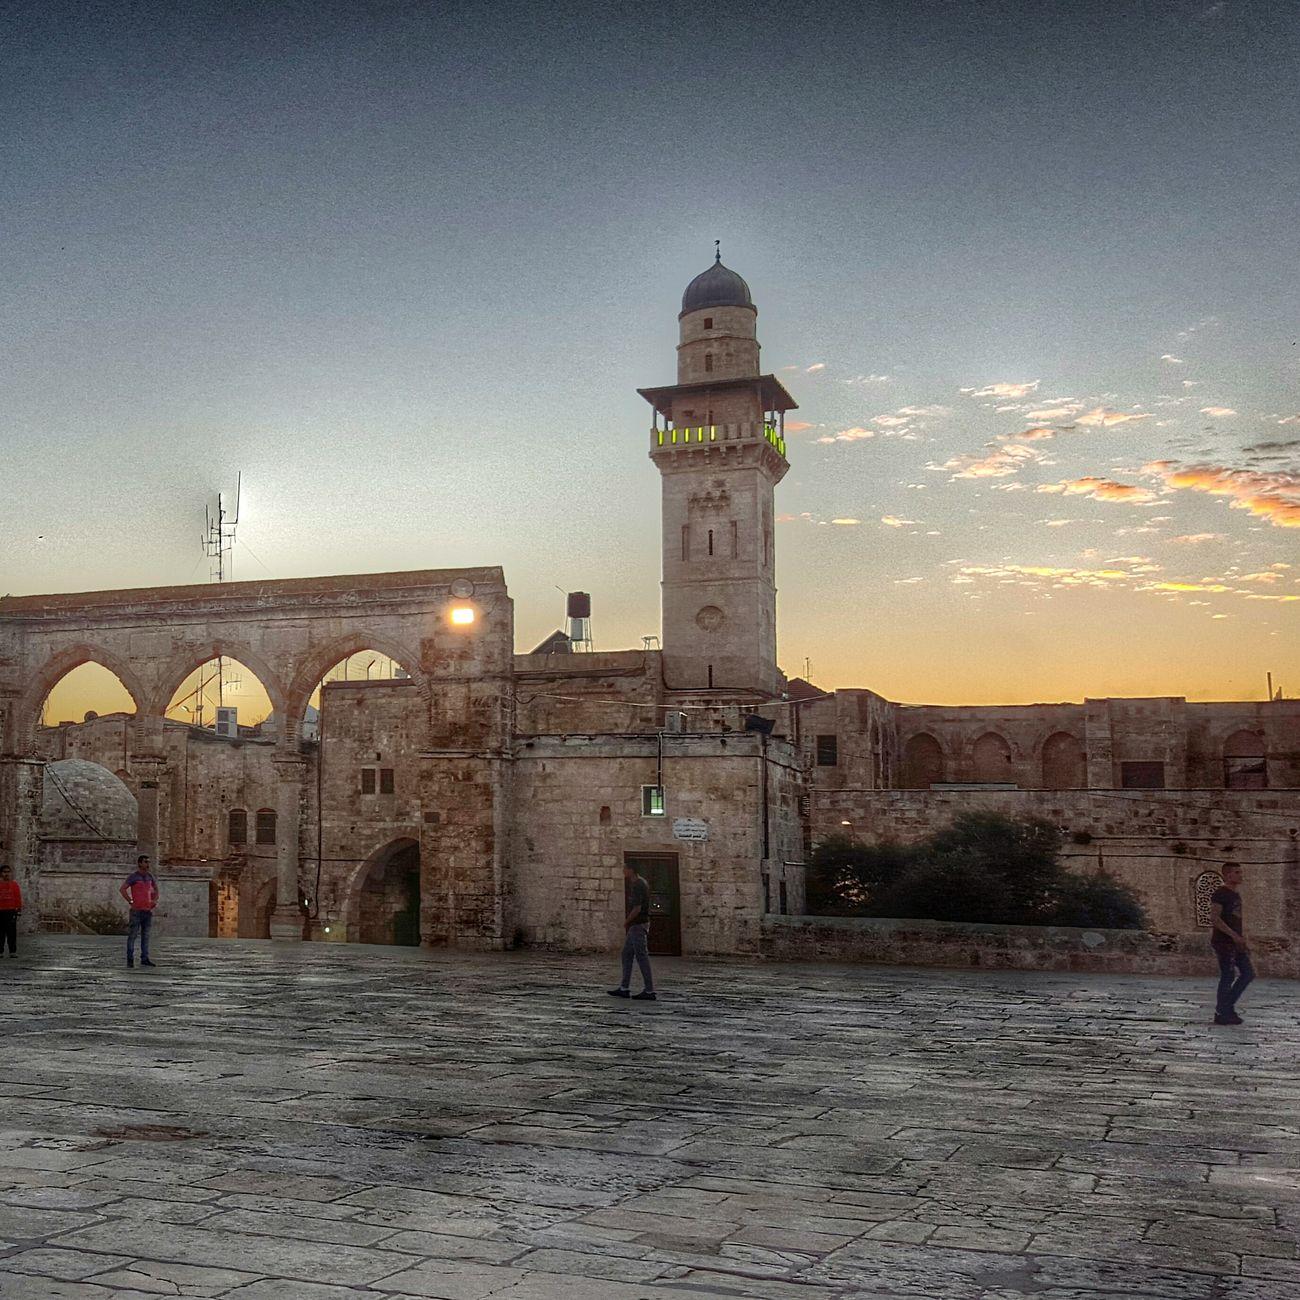 Worldwide_shot Likeforlike Eyem Best Shots Old Jerusalem Streetphotography Streetphoto_color Street Life Kuddüs